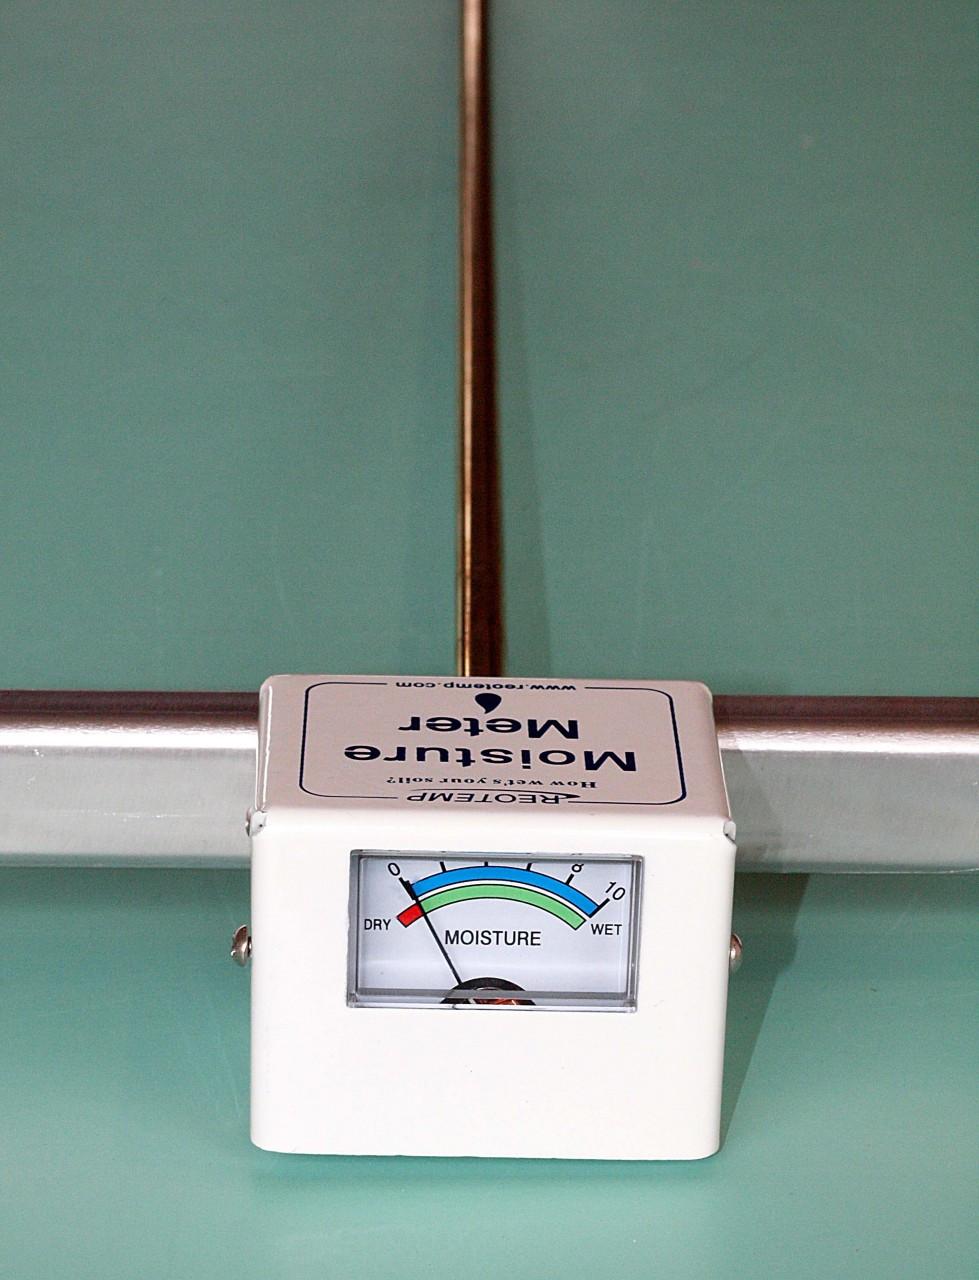 Reotmep compost moisture meter